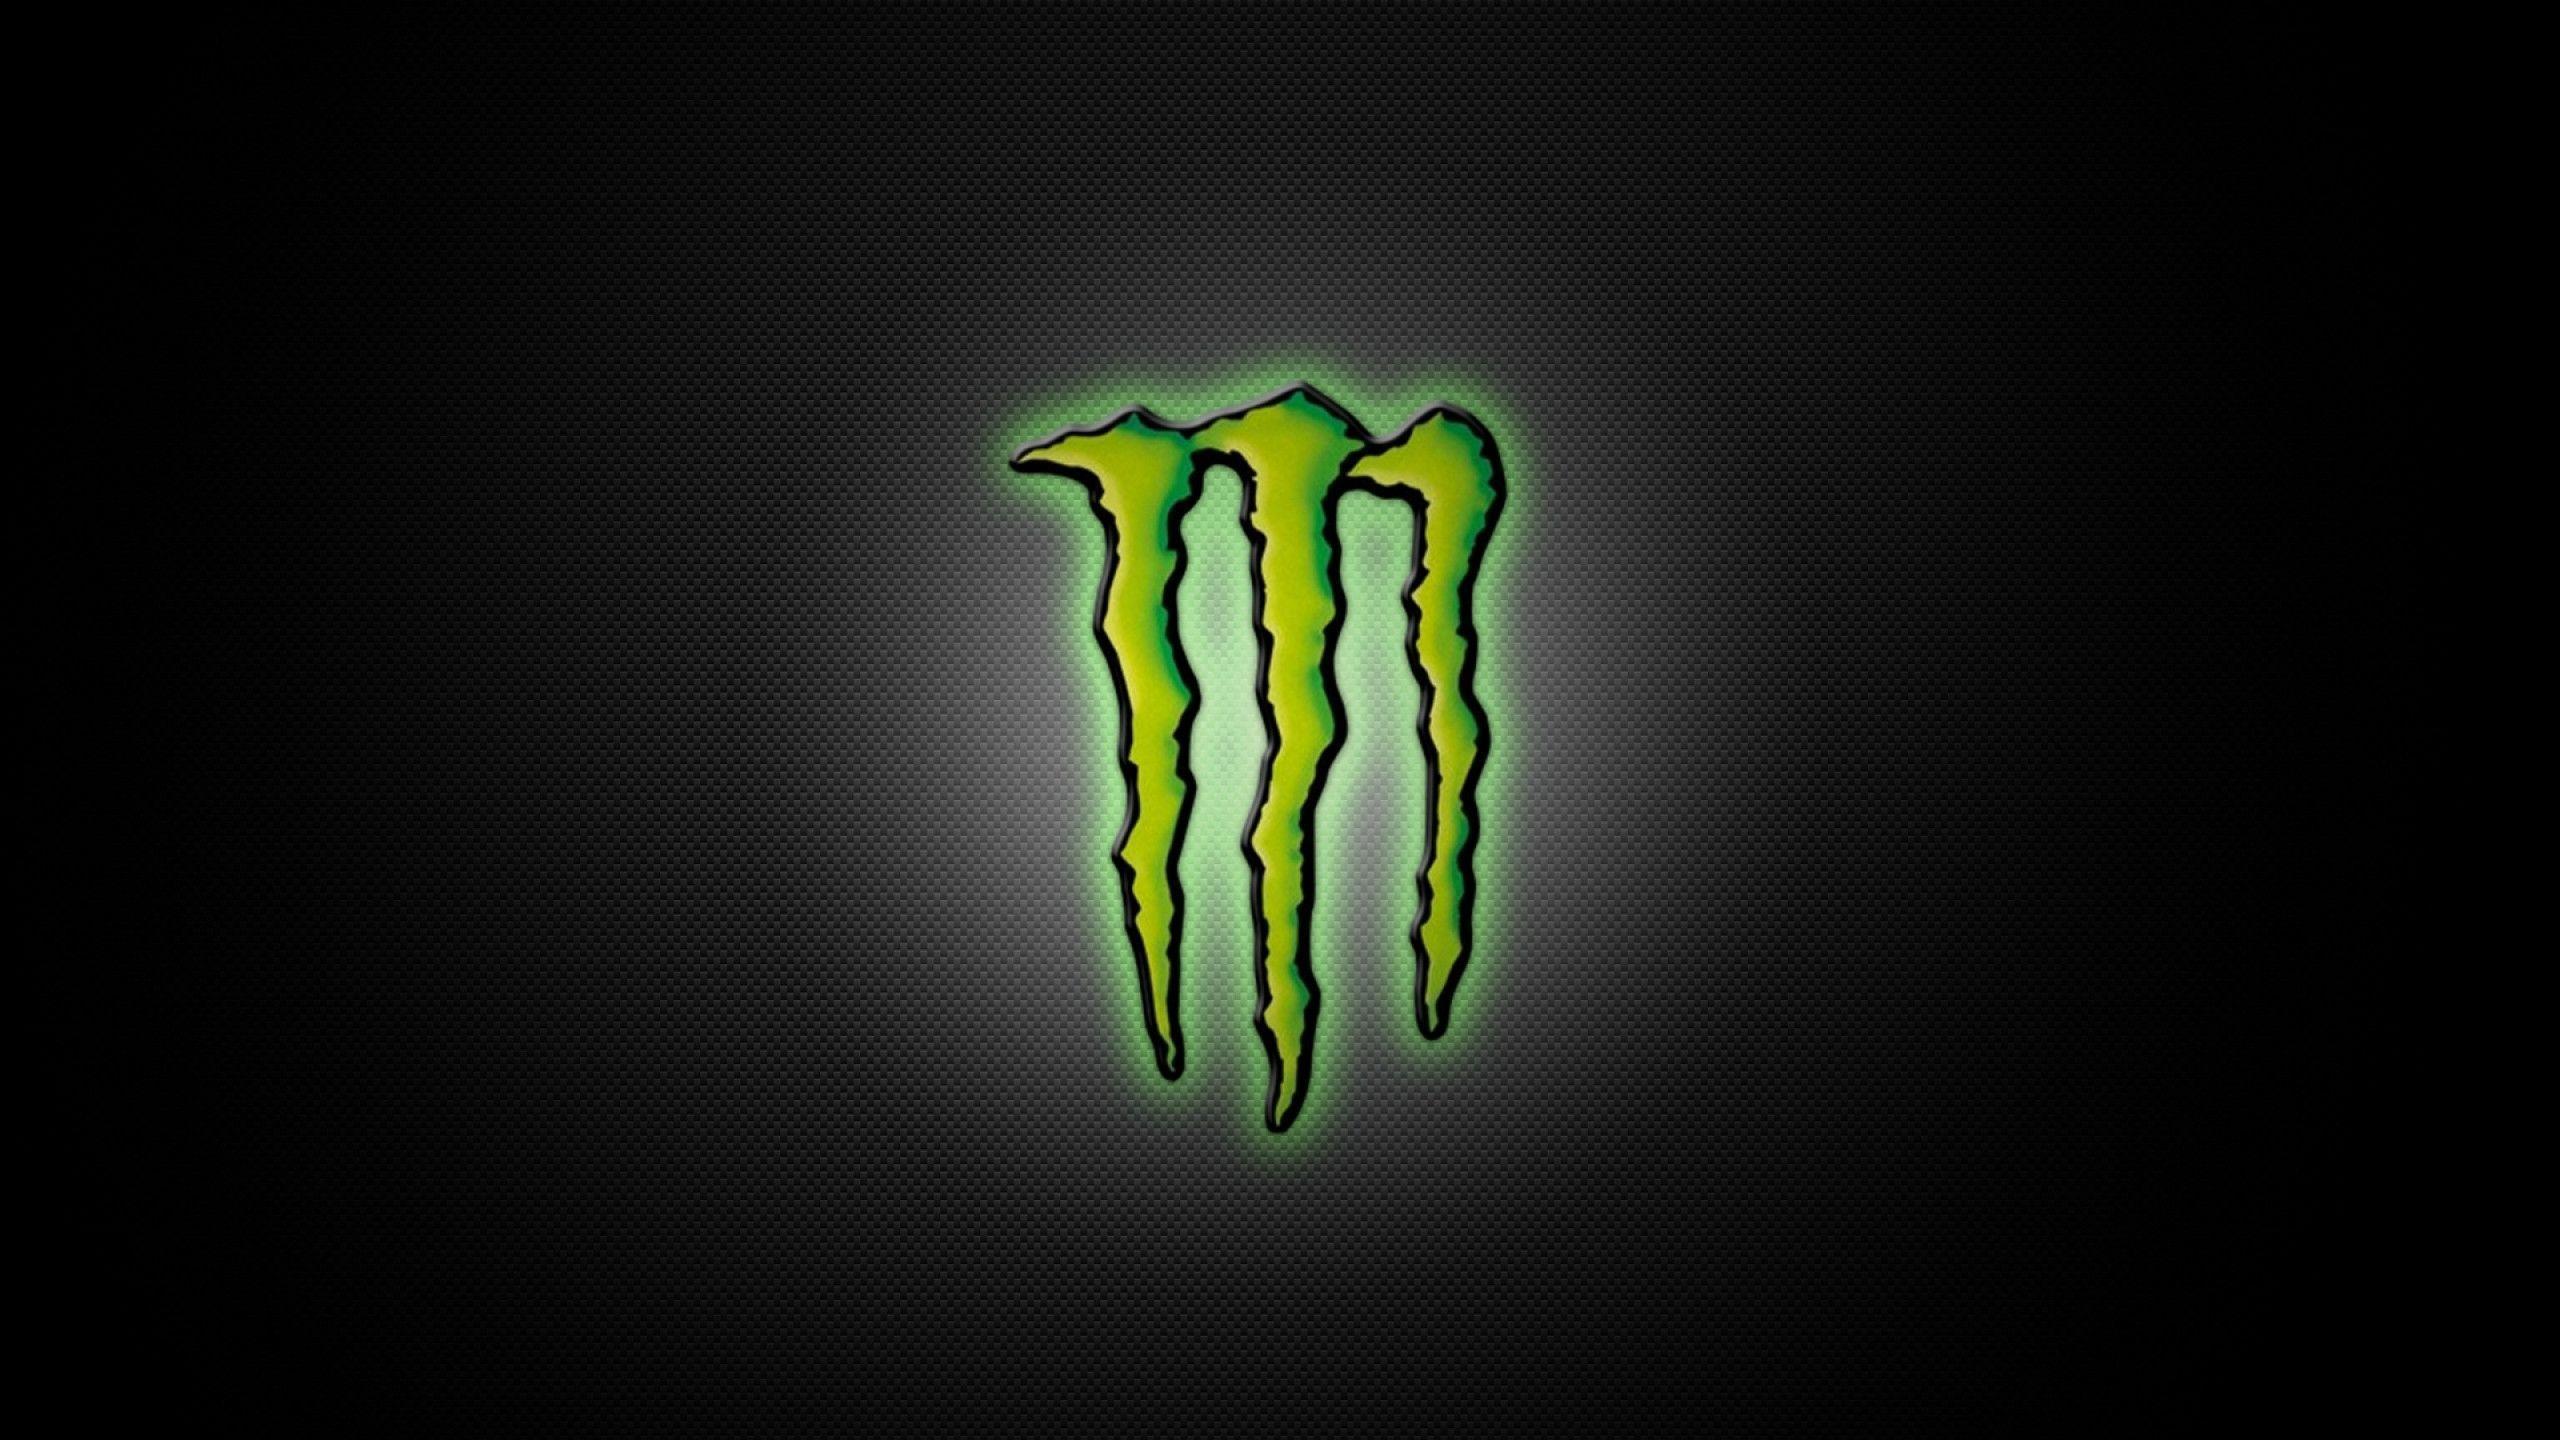 Fox racing monster energy logo